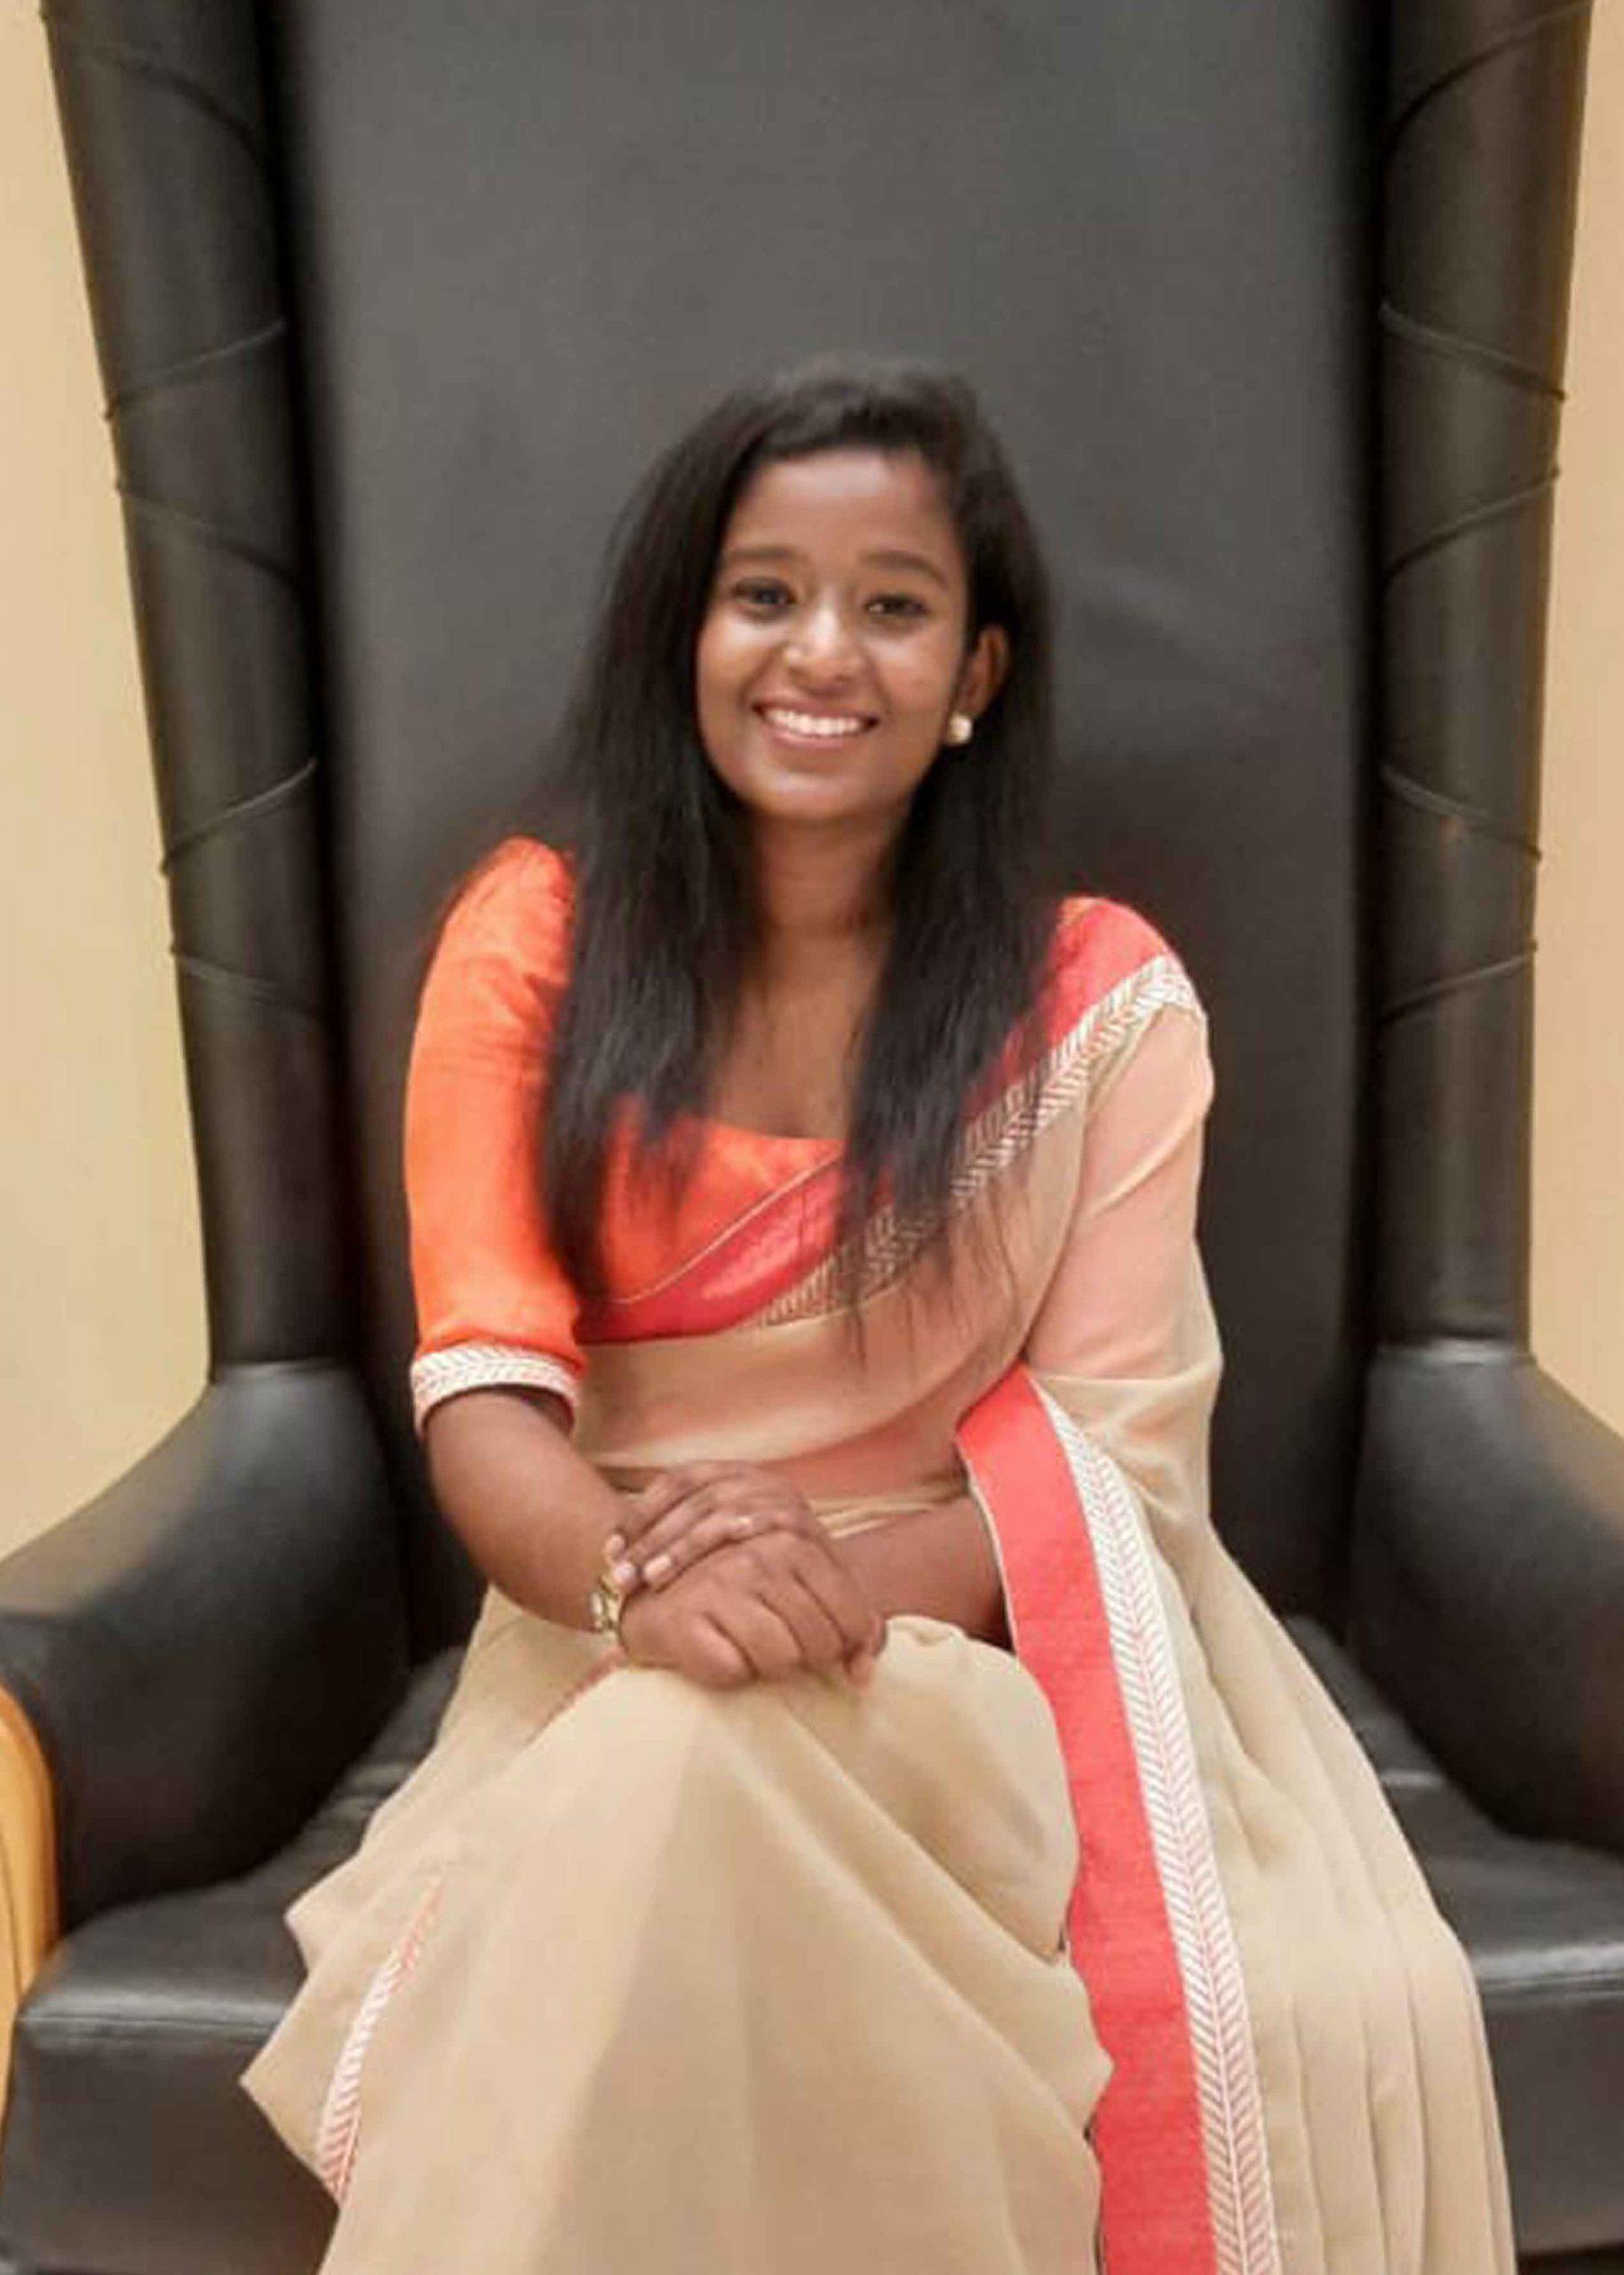 Tharusha Dilshani